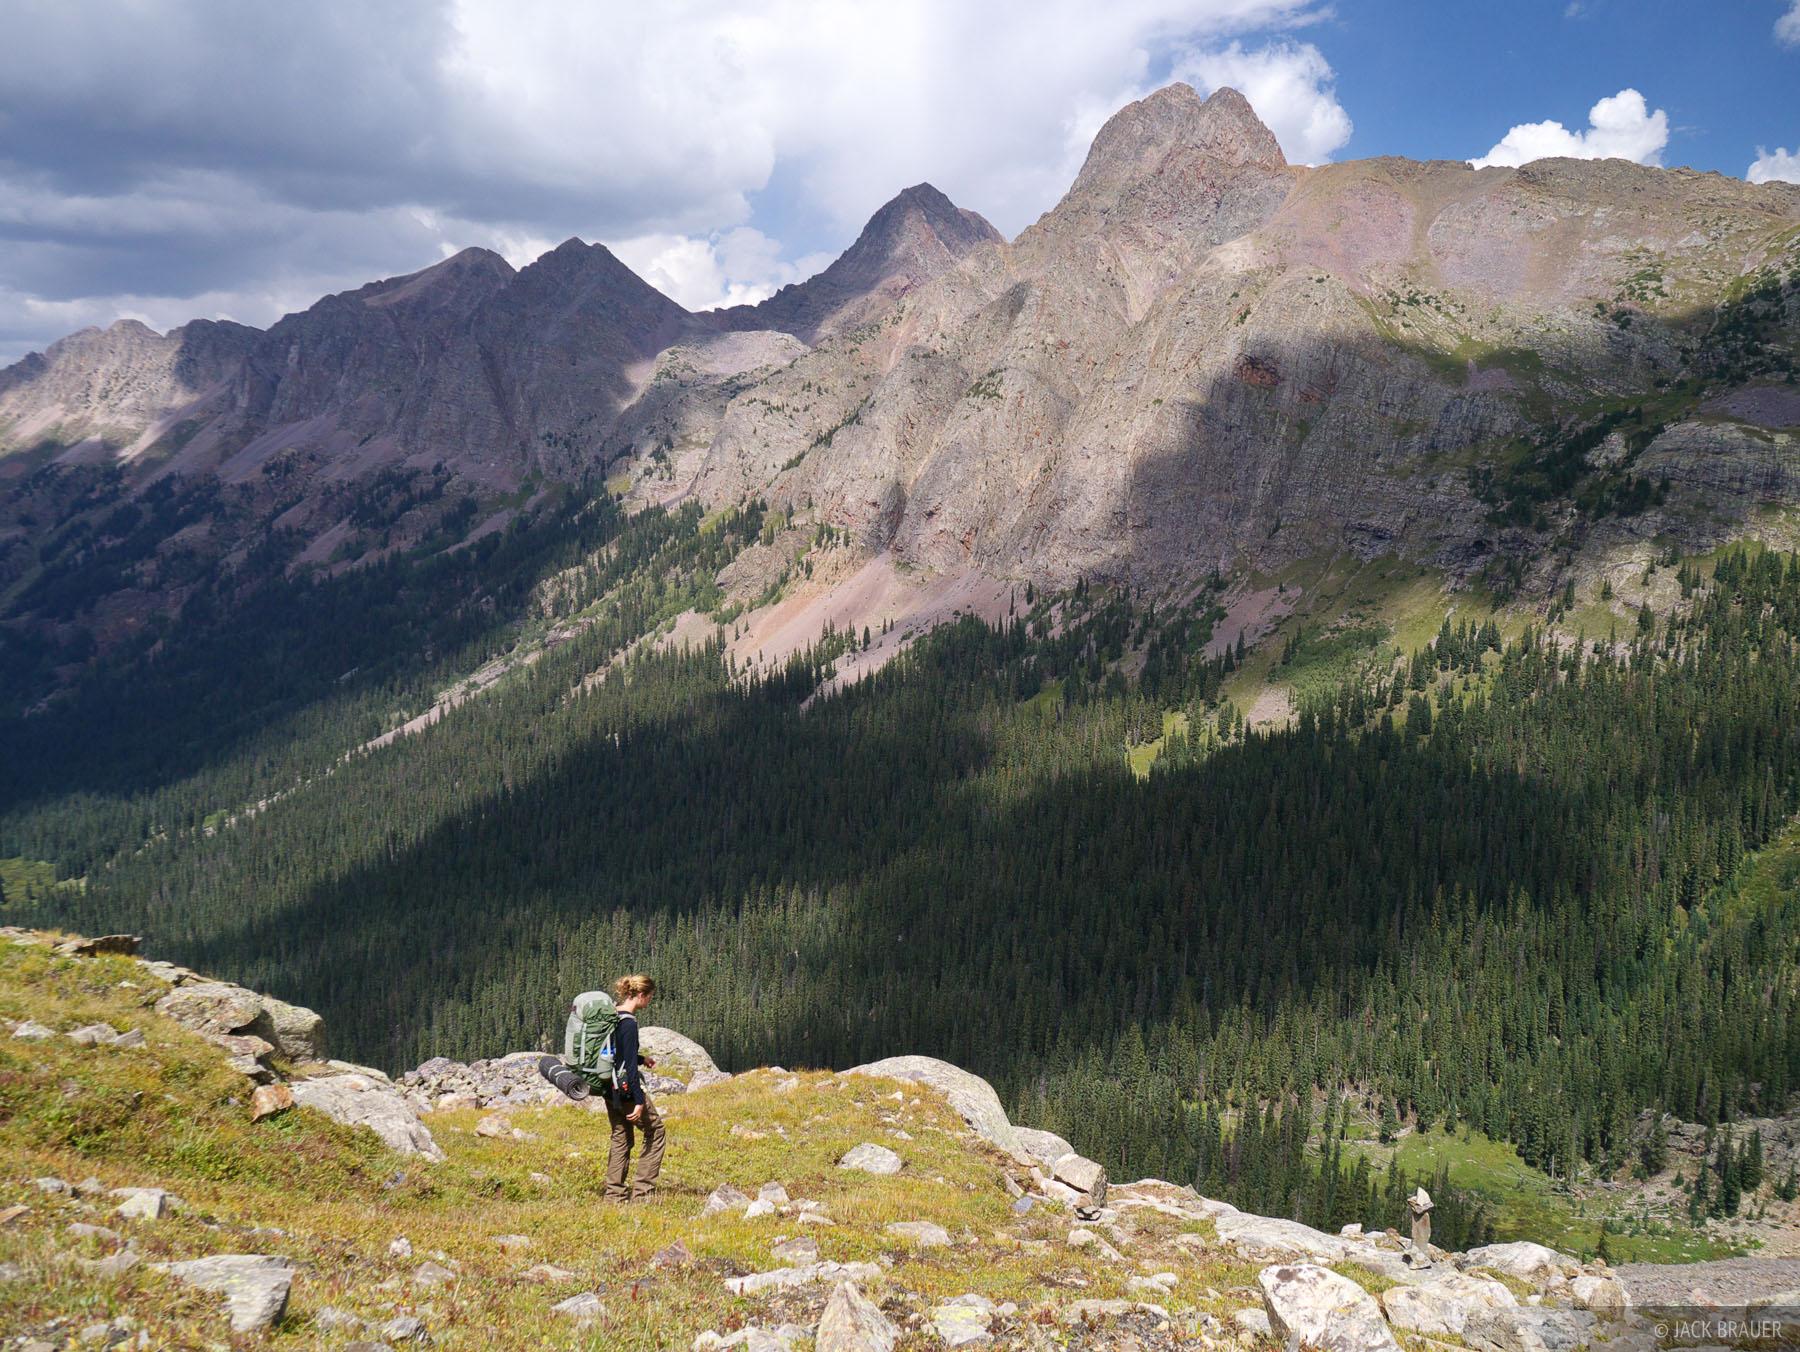 Vestal Peak, Grenadier Range, Weminuche Wilderness, San Juan Mountains, Colorado, hiking, backpacking, photo